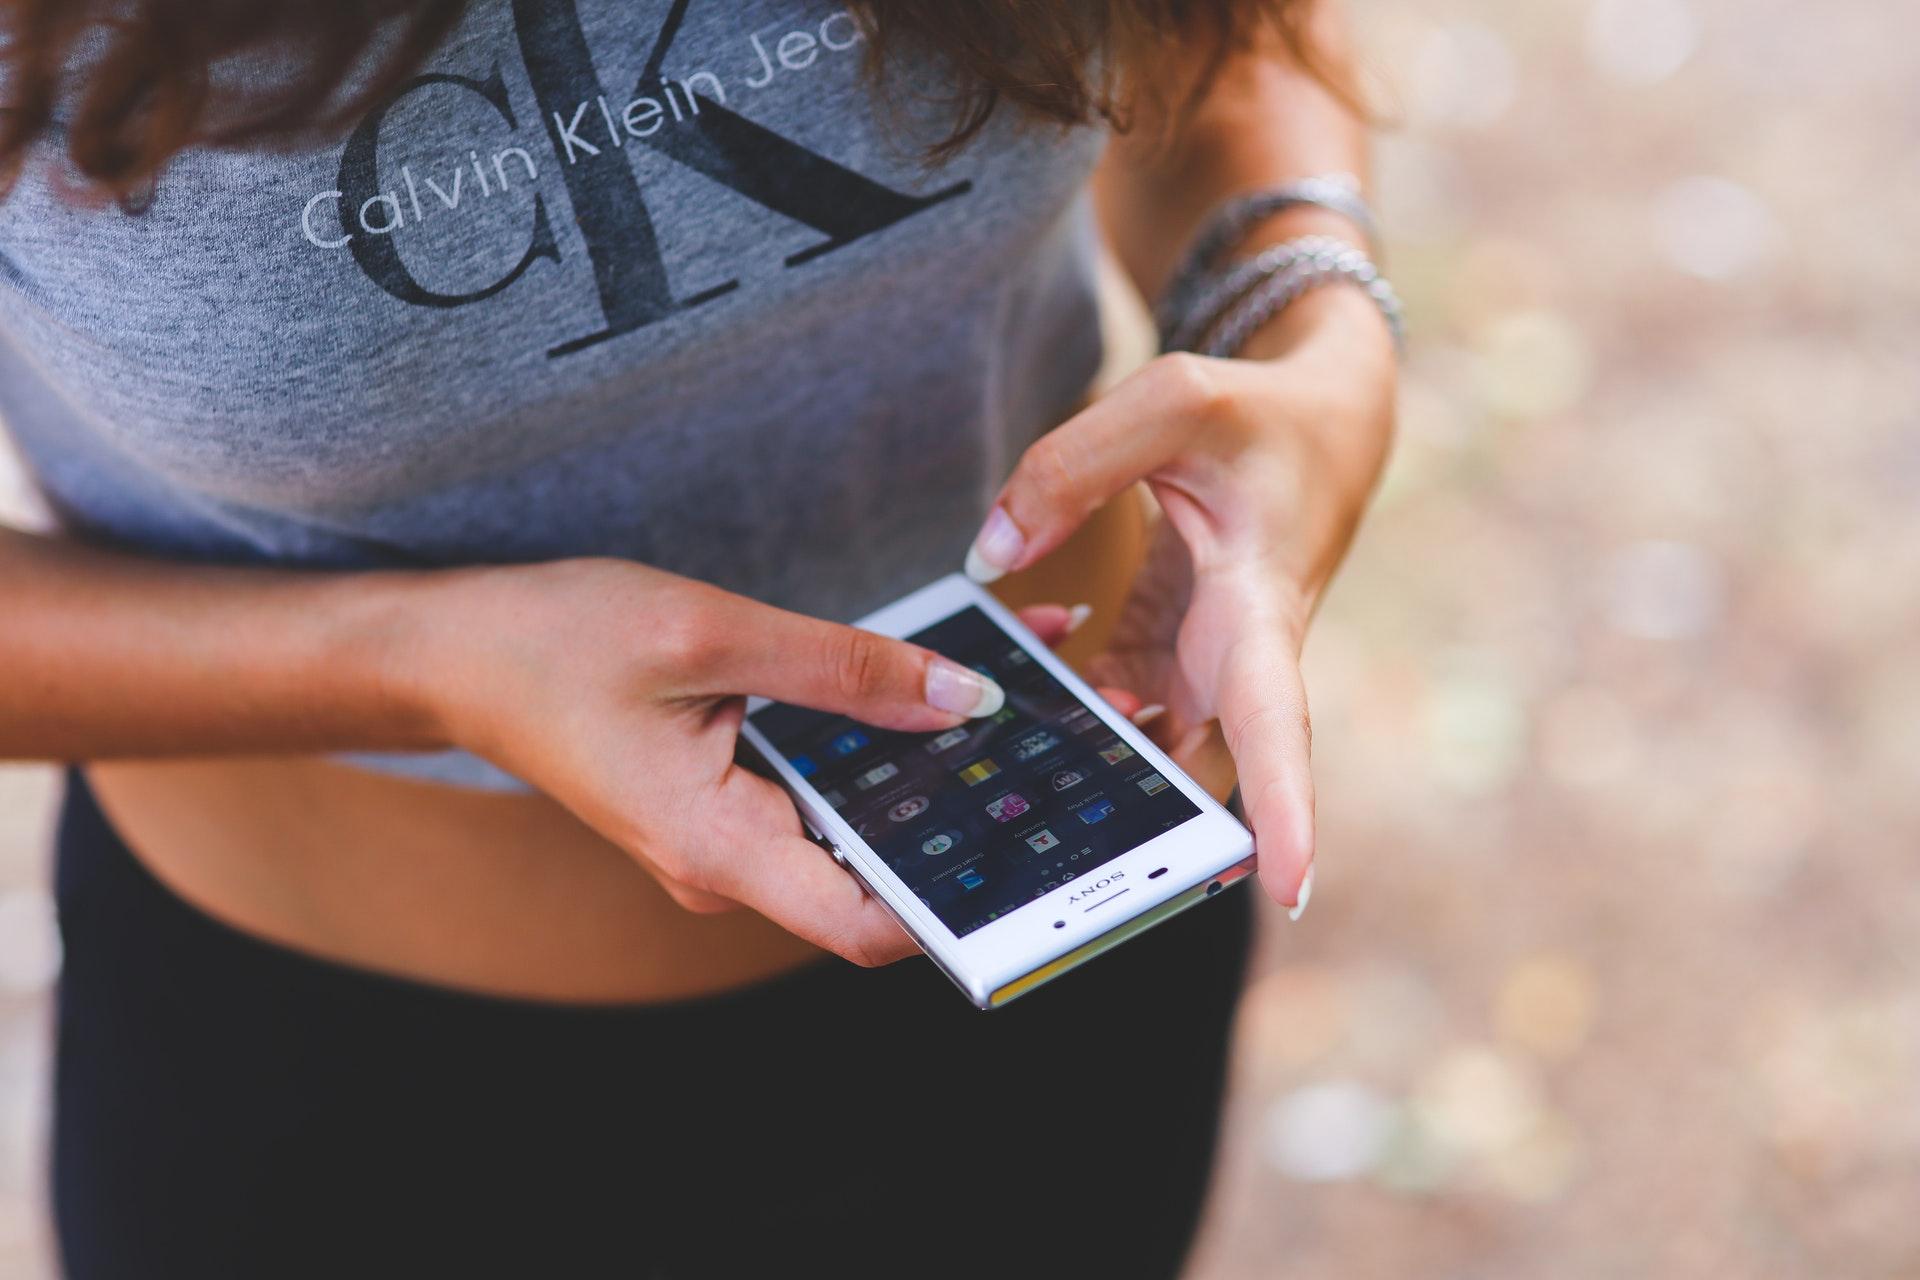 hands-people-woman-smartphone.jpg